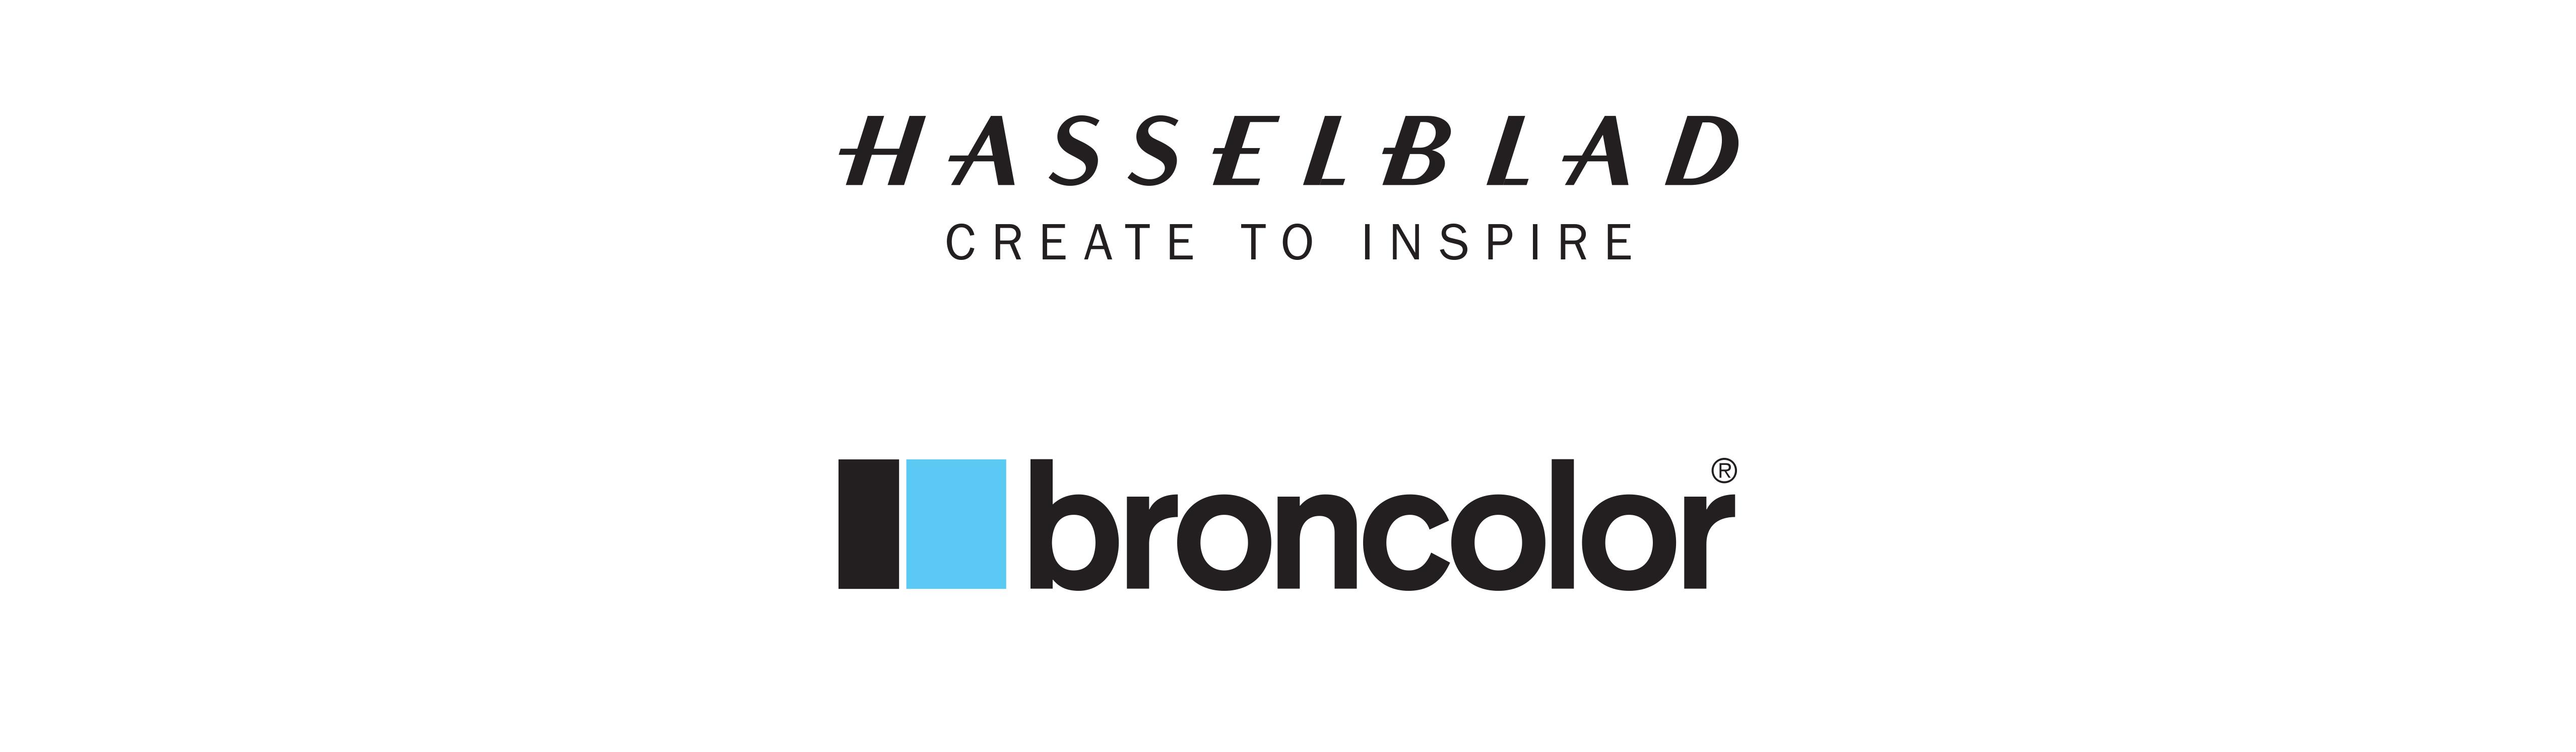 pro solutions workshop san francisco w hasselblad broncolor